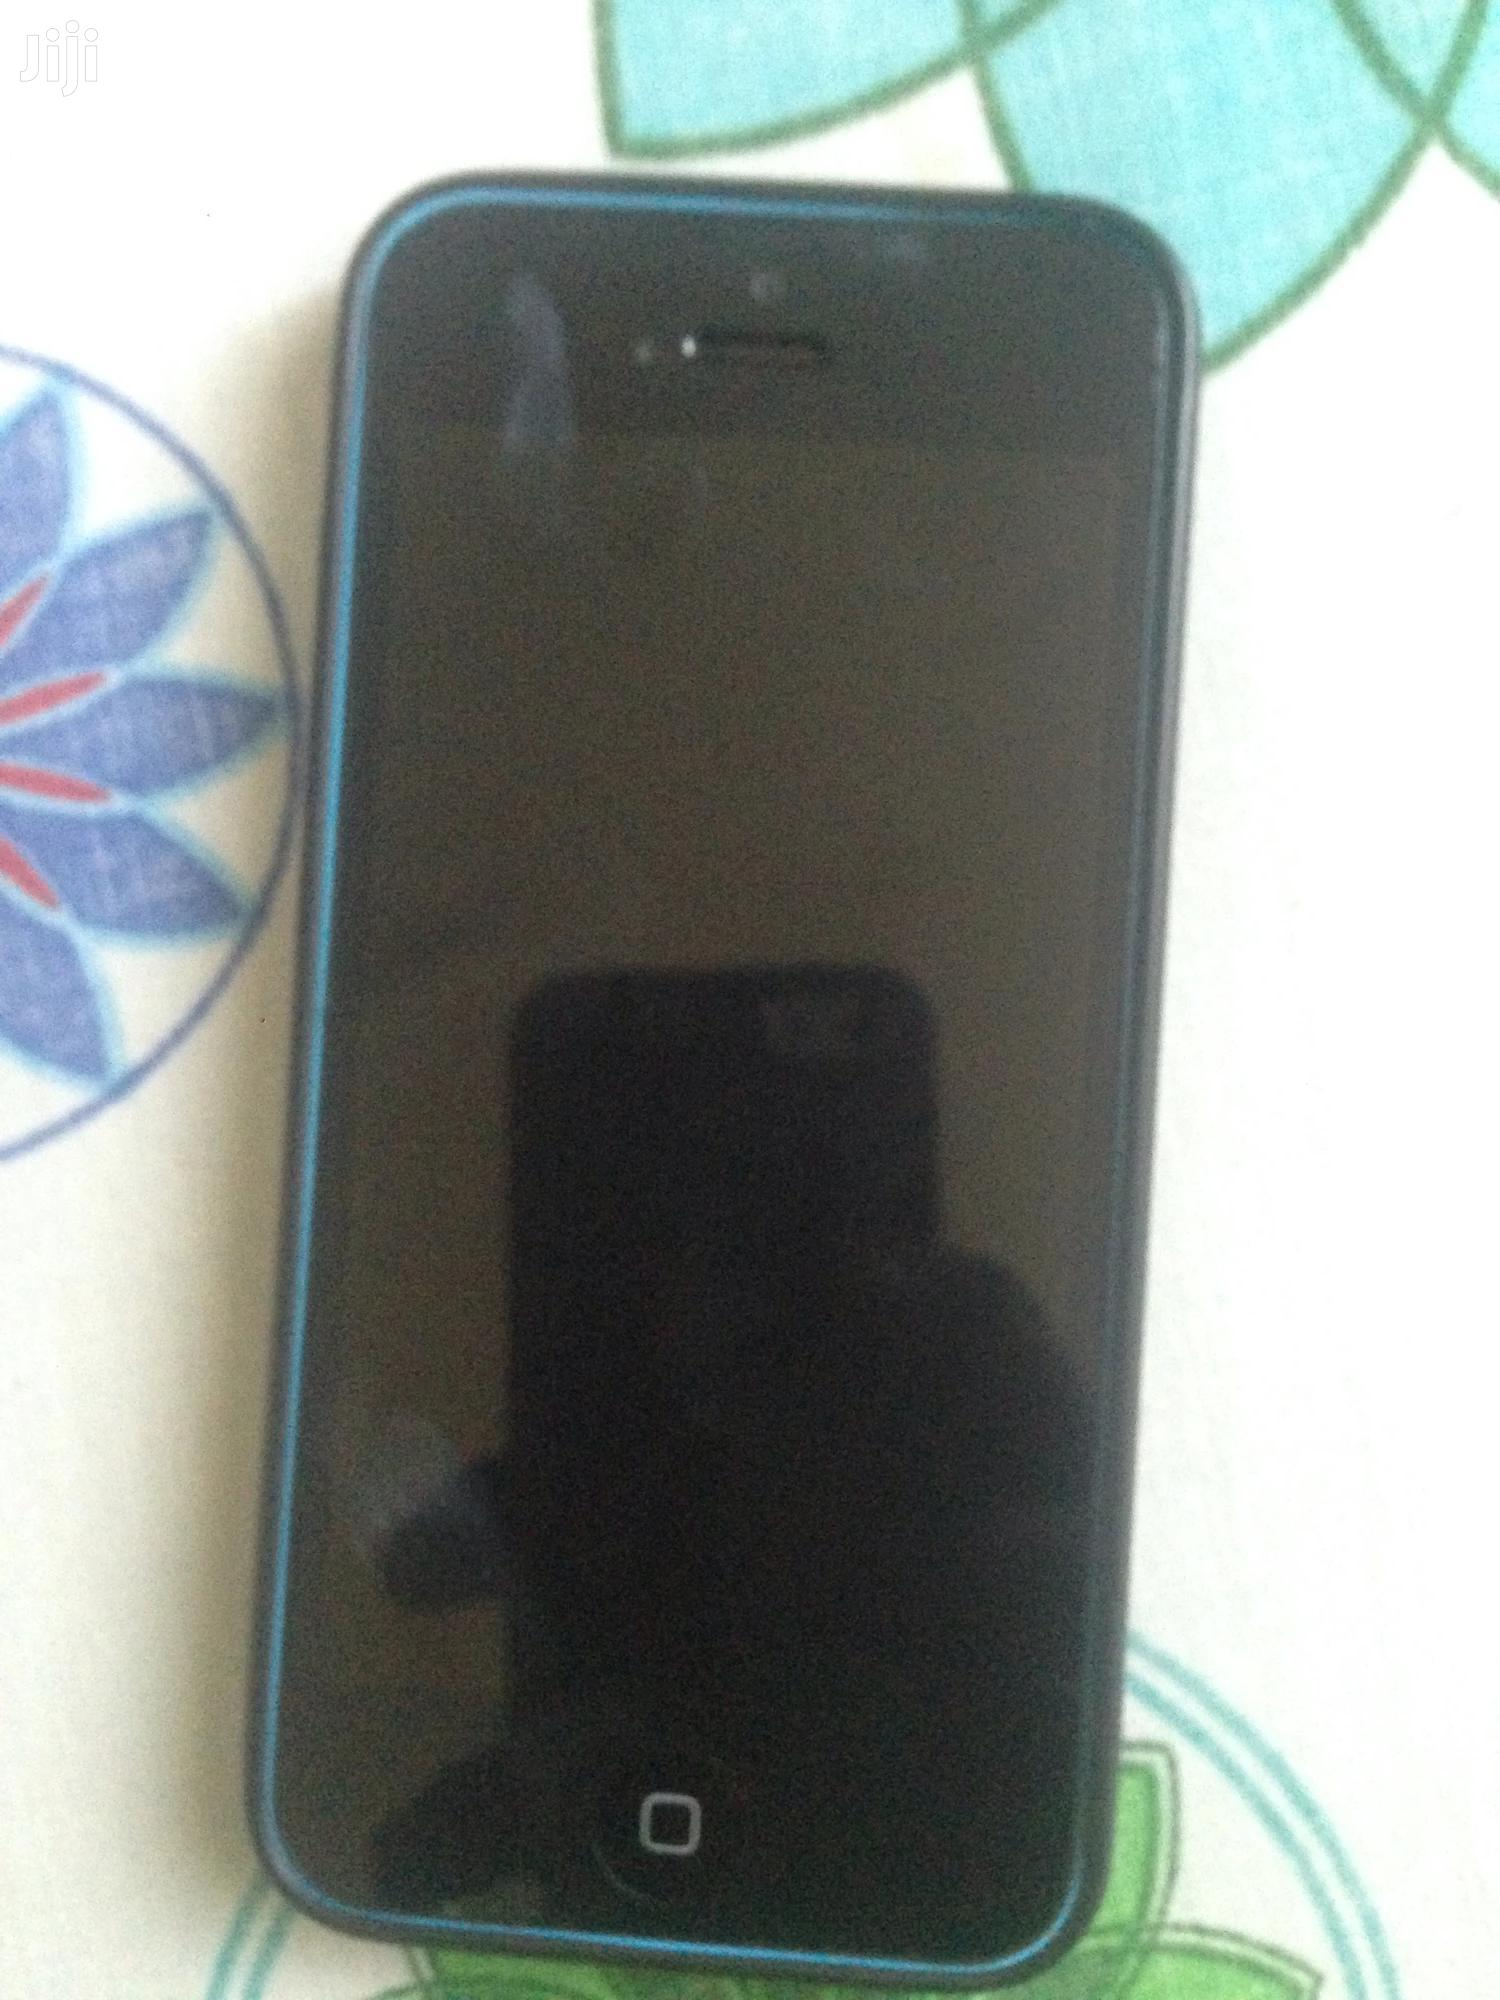 Archive: Apple iPhone 5s 16 GB